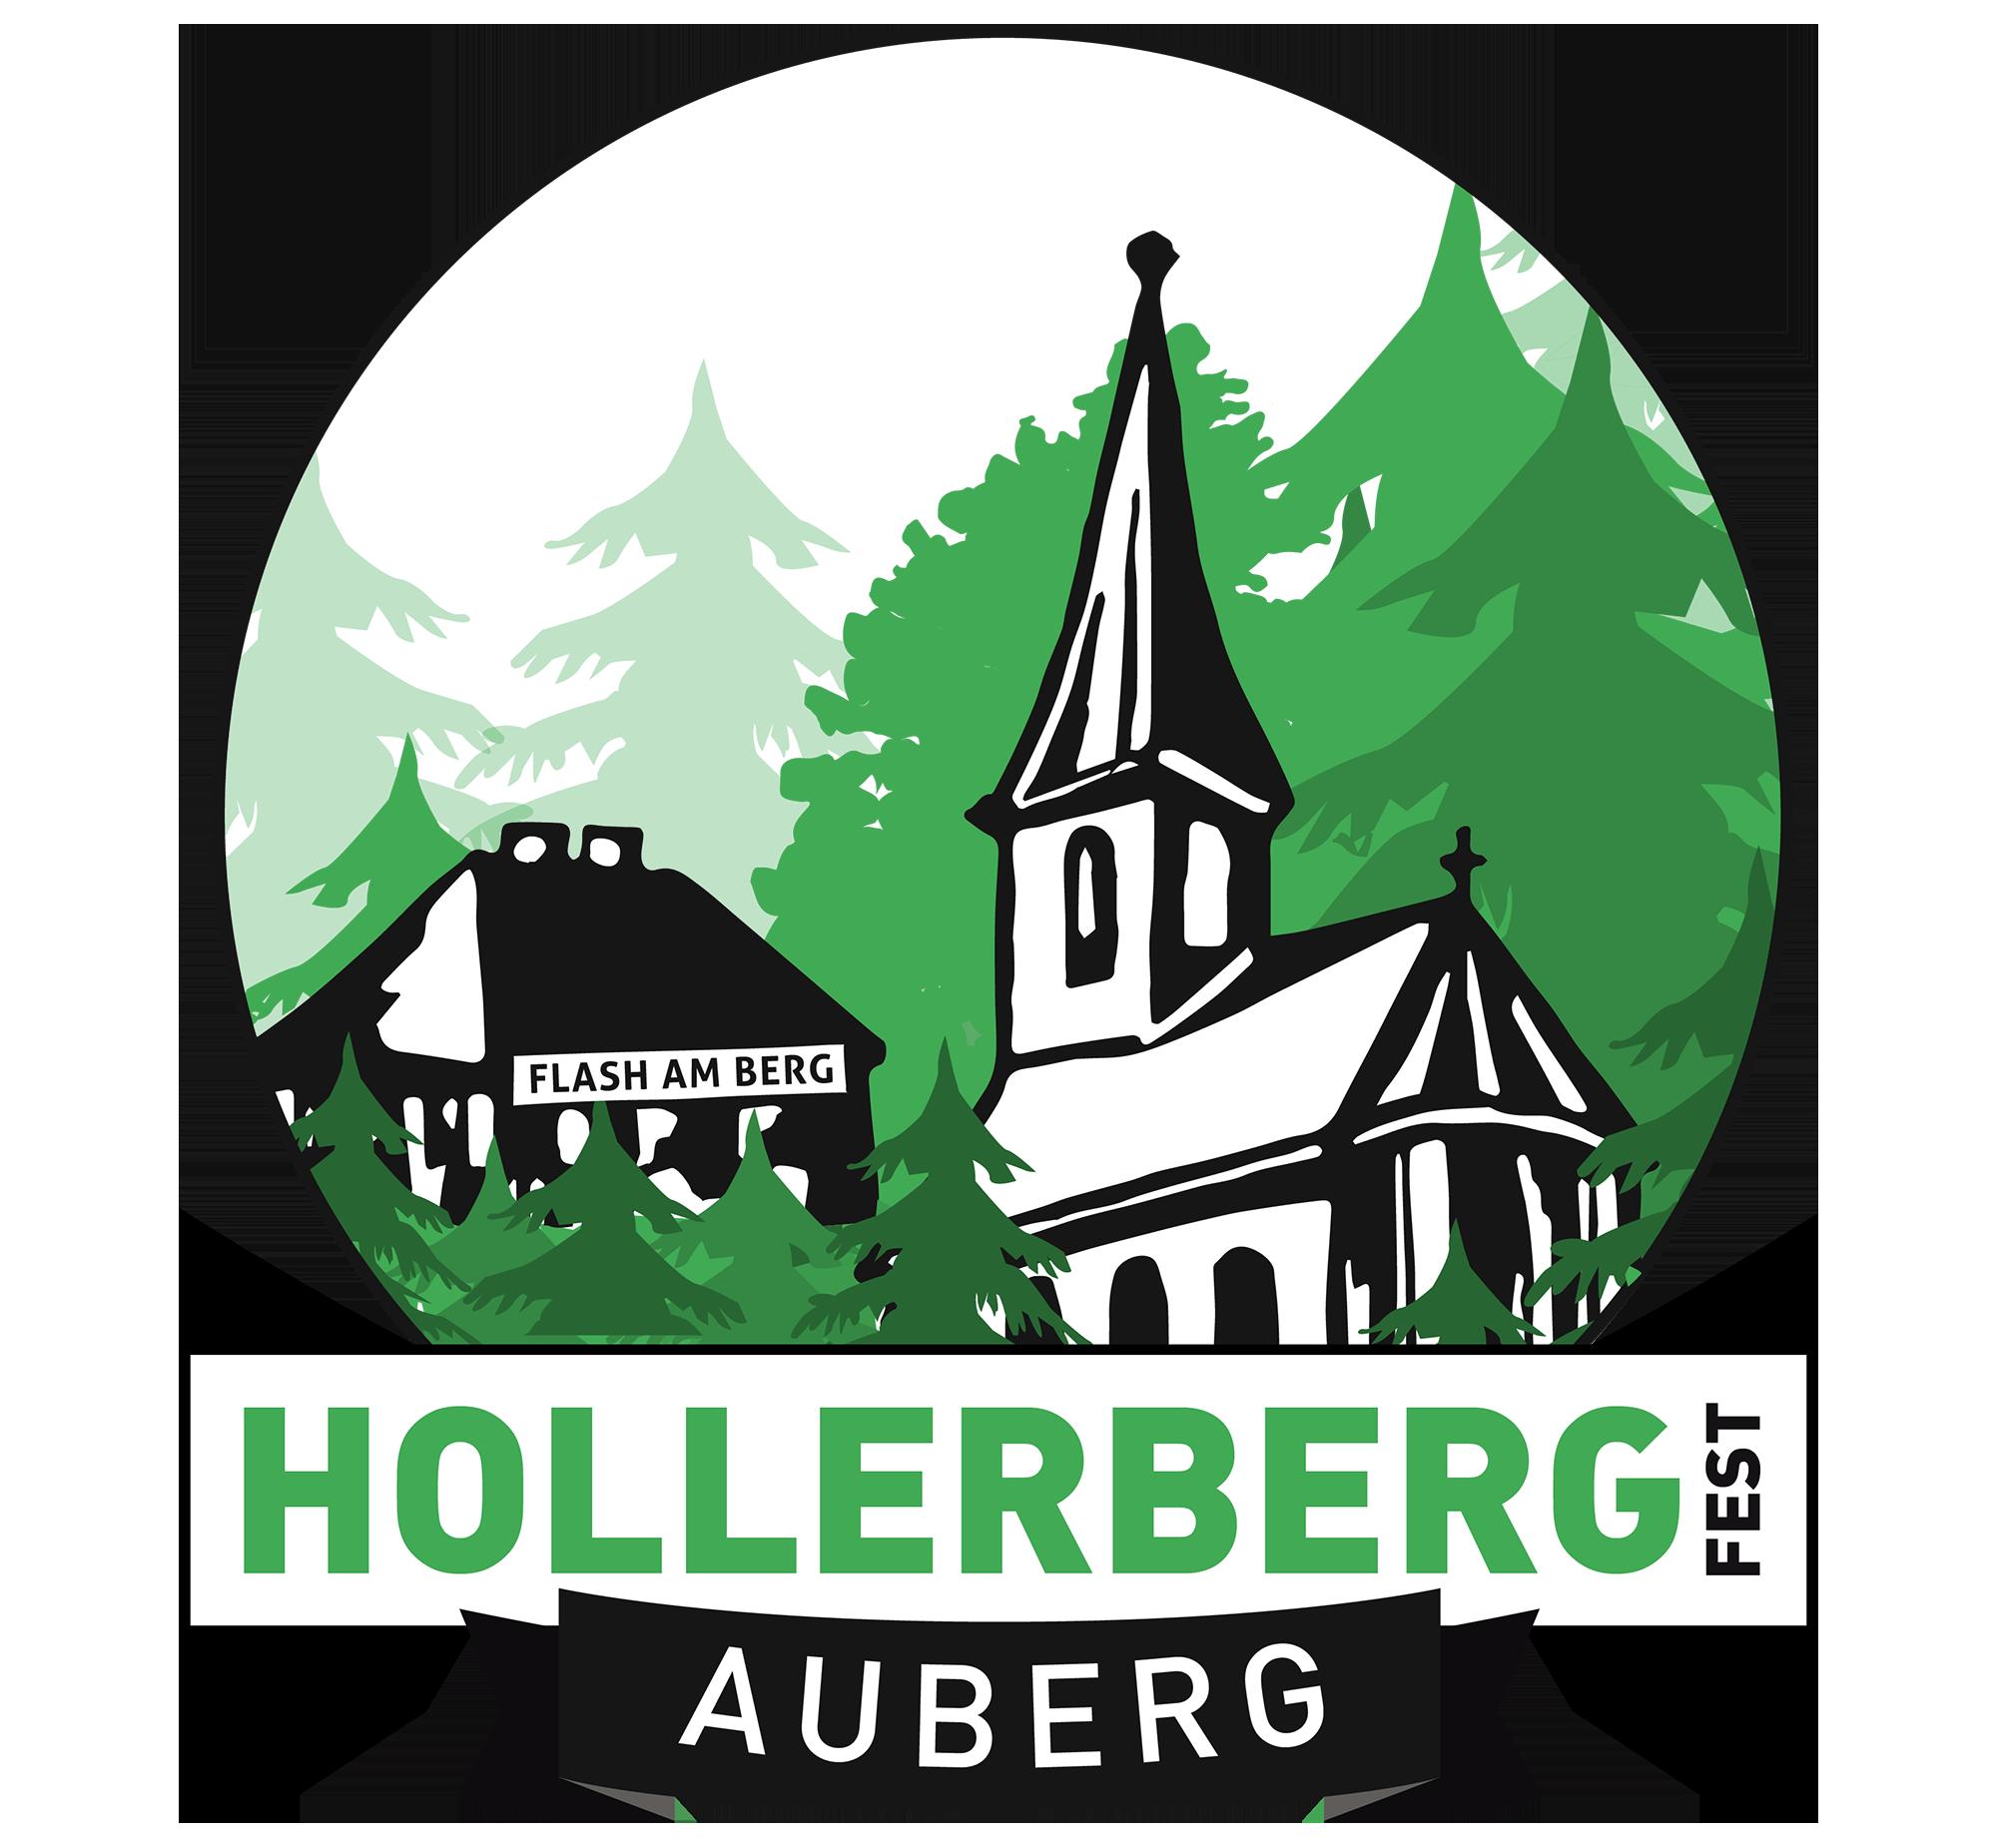 Hollerbergfest Auberg